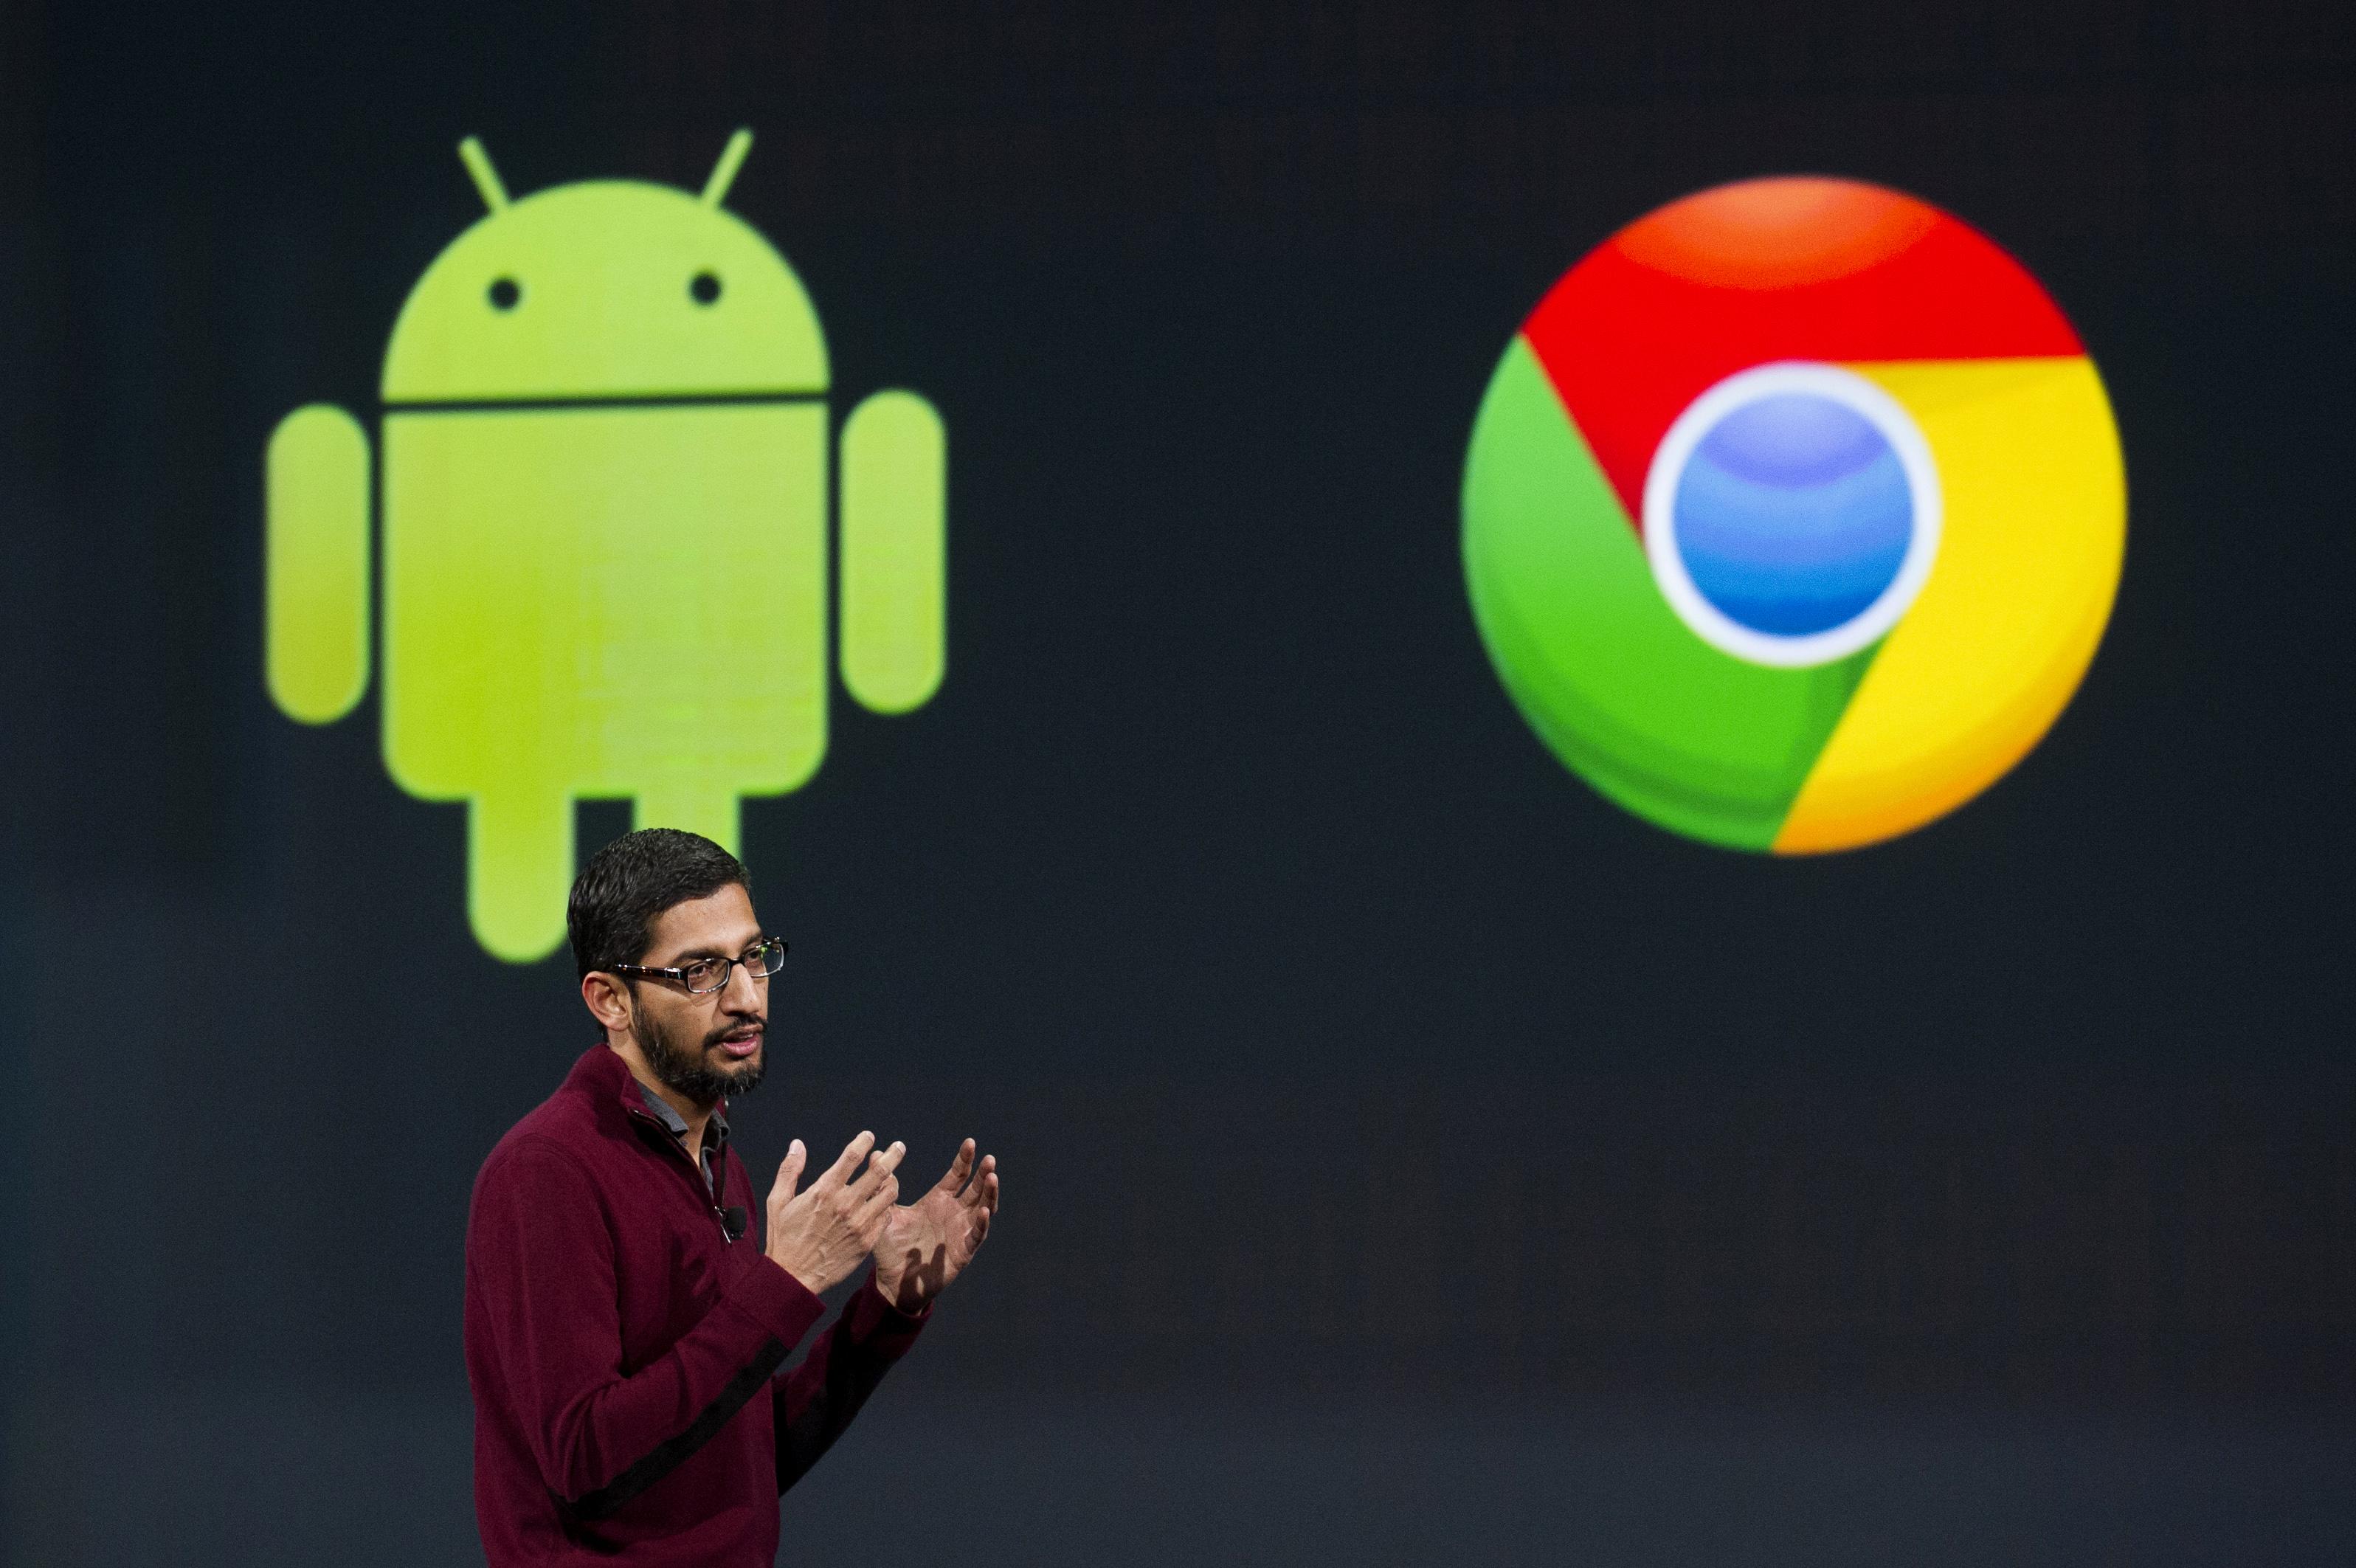 Inside The Google I O Developers Conference